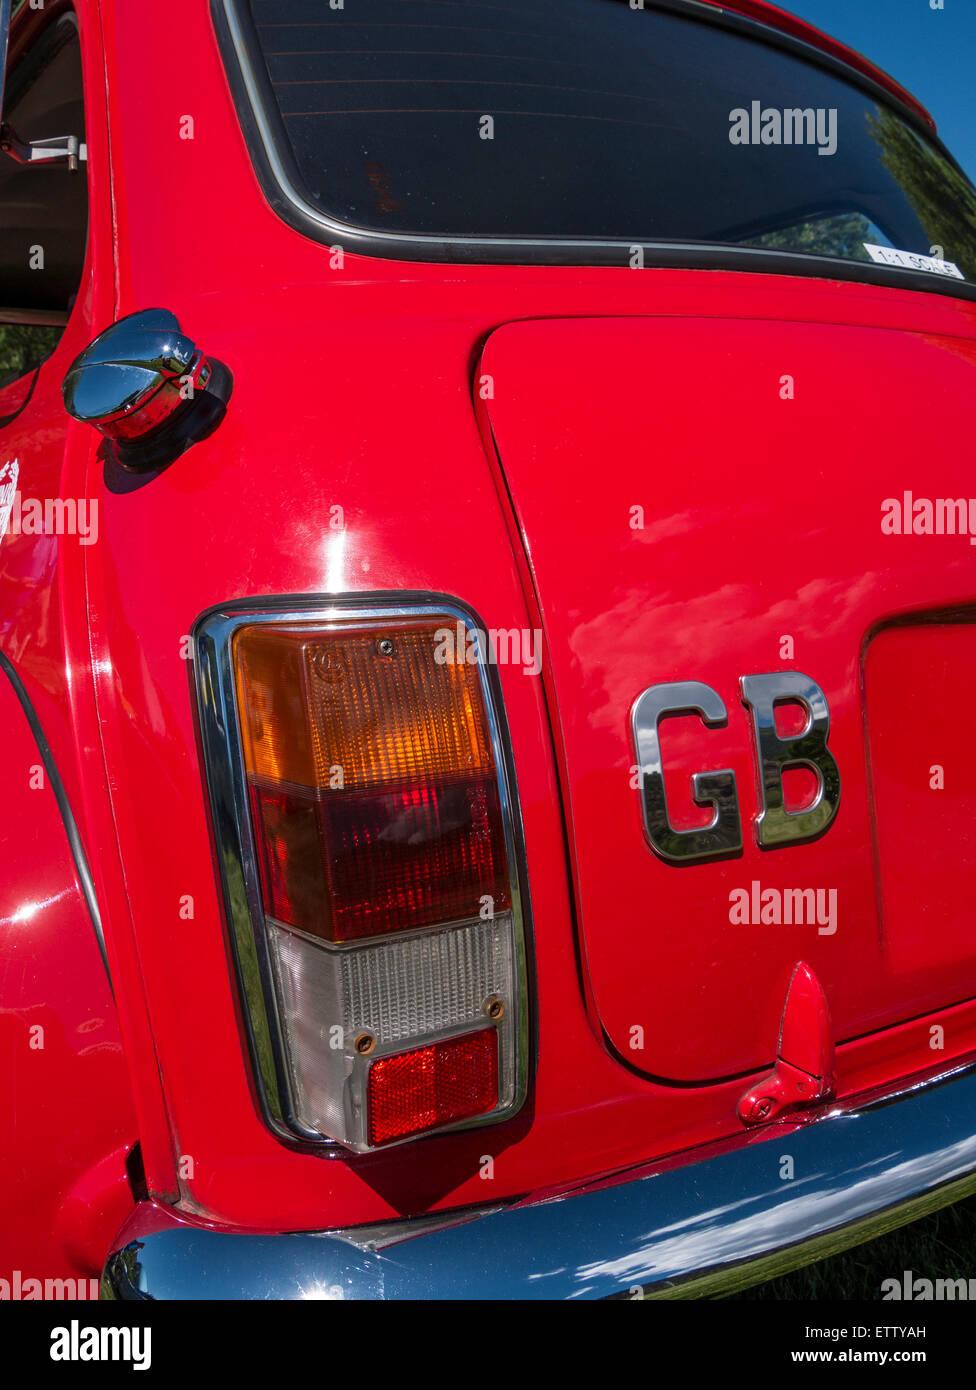 1974 Mini Cooper, MG Car Rallye, Glenwood Springs, Colorado. - Stock Image